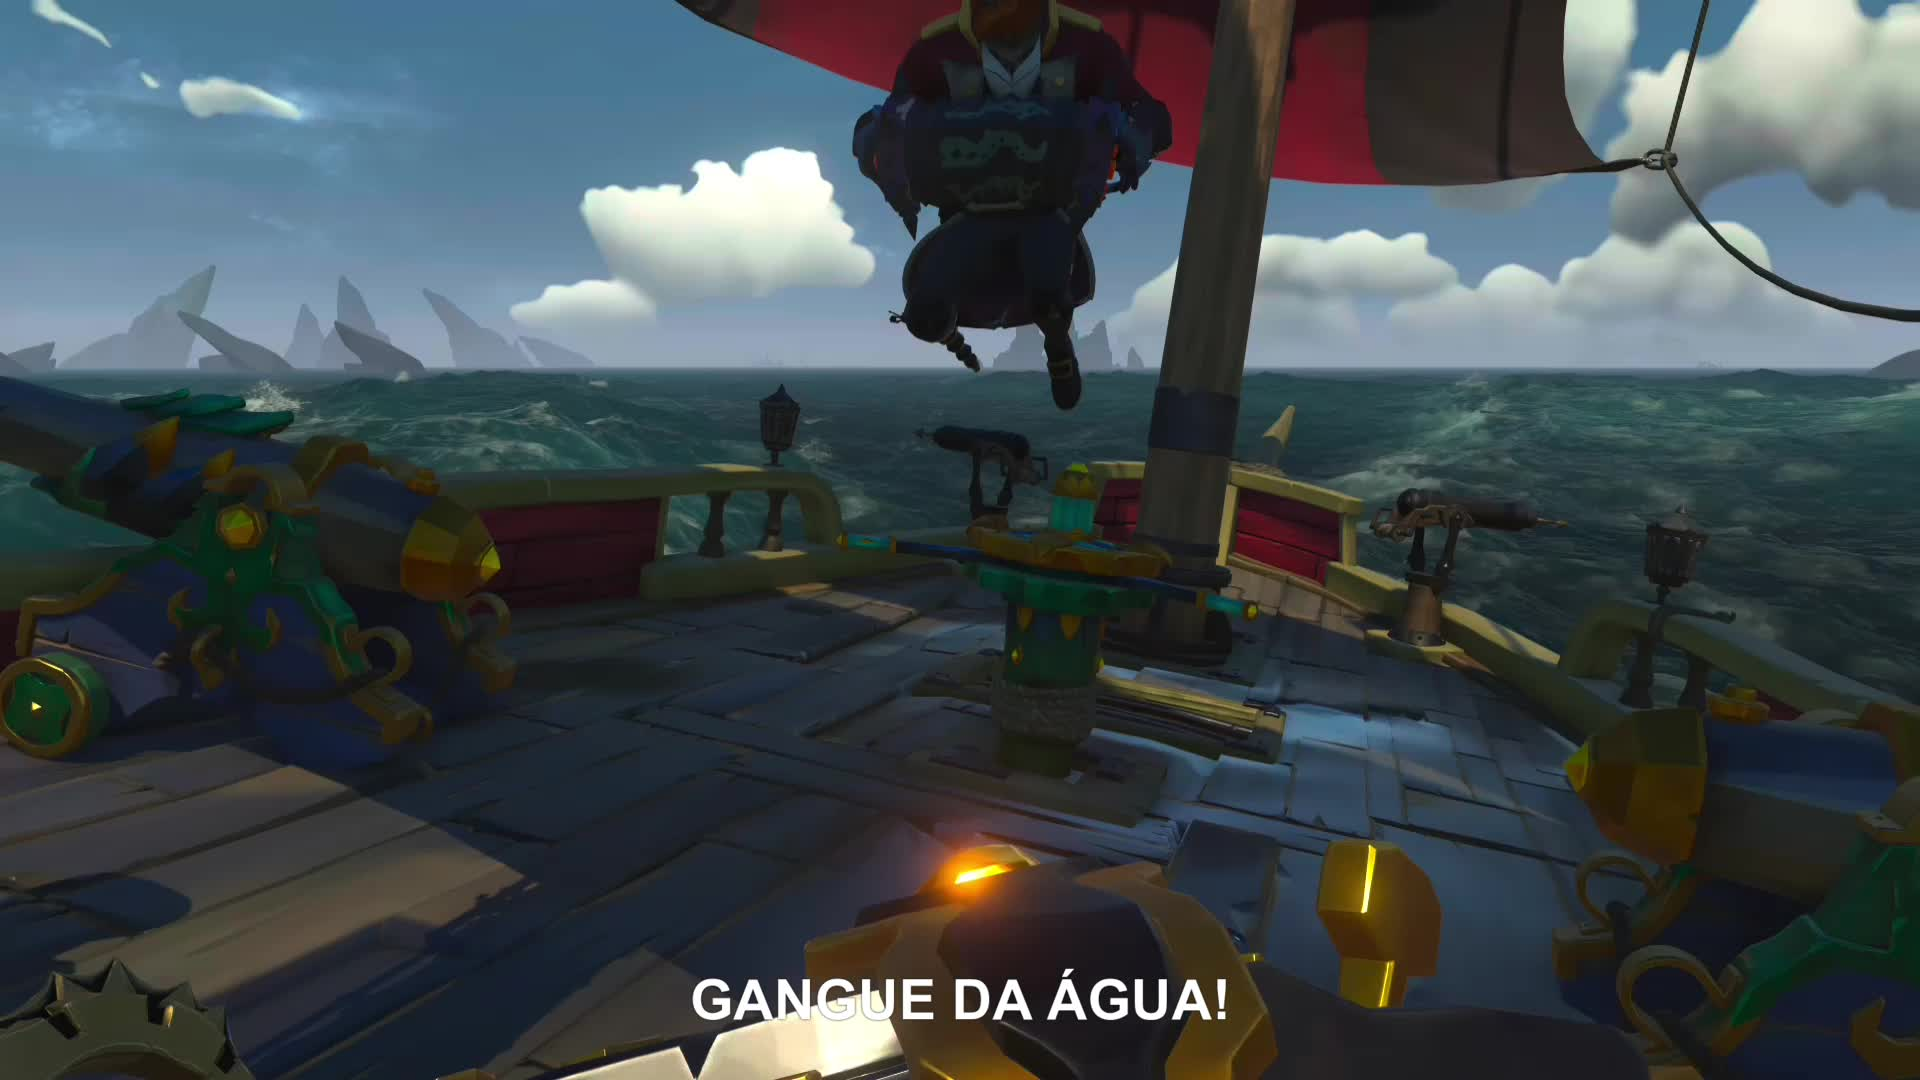 Brizzier, SeaofThieves, gamer dvr, xbox, xbox one, Gangue da Água GIFs